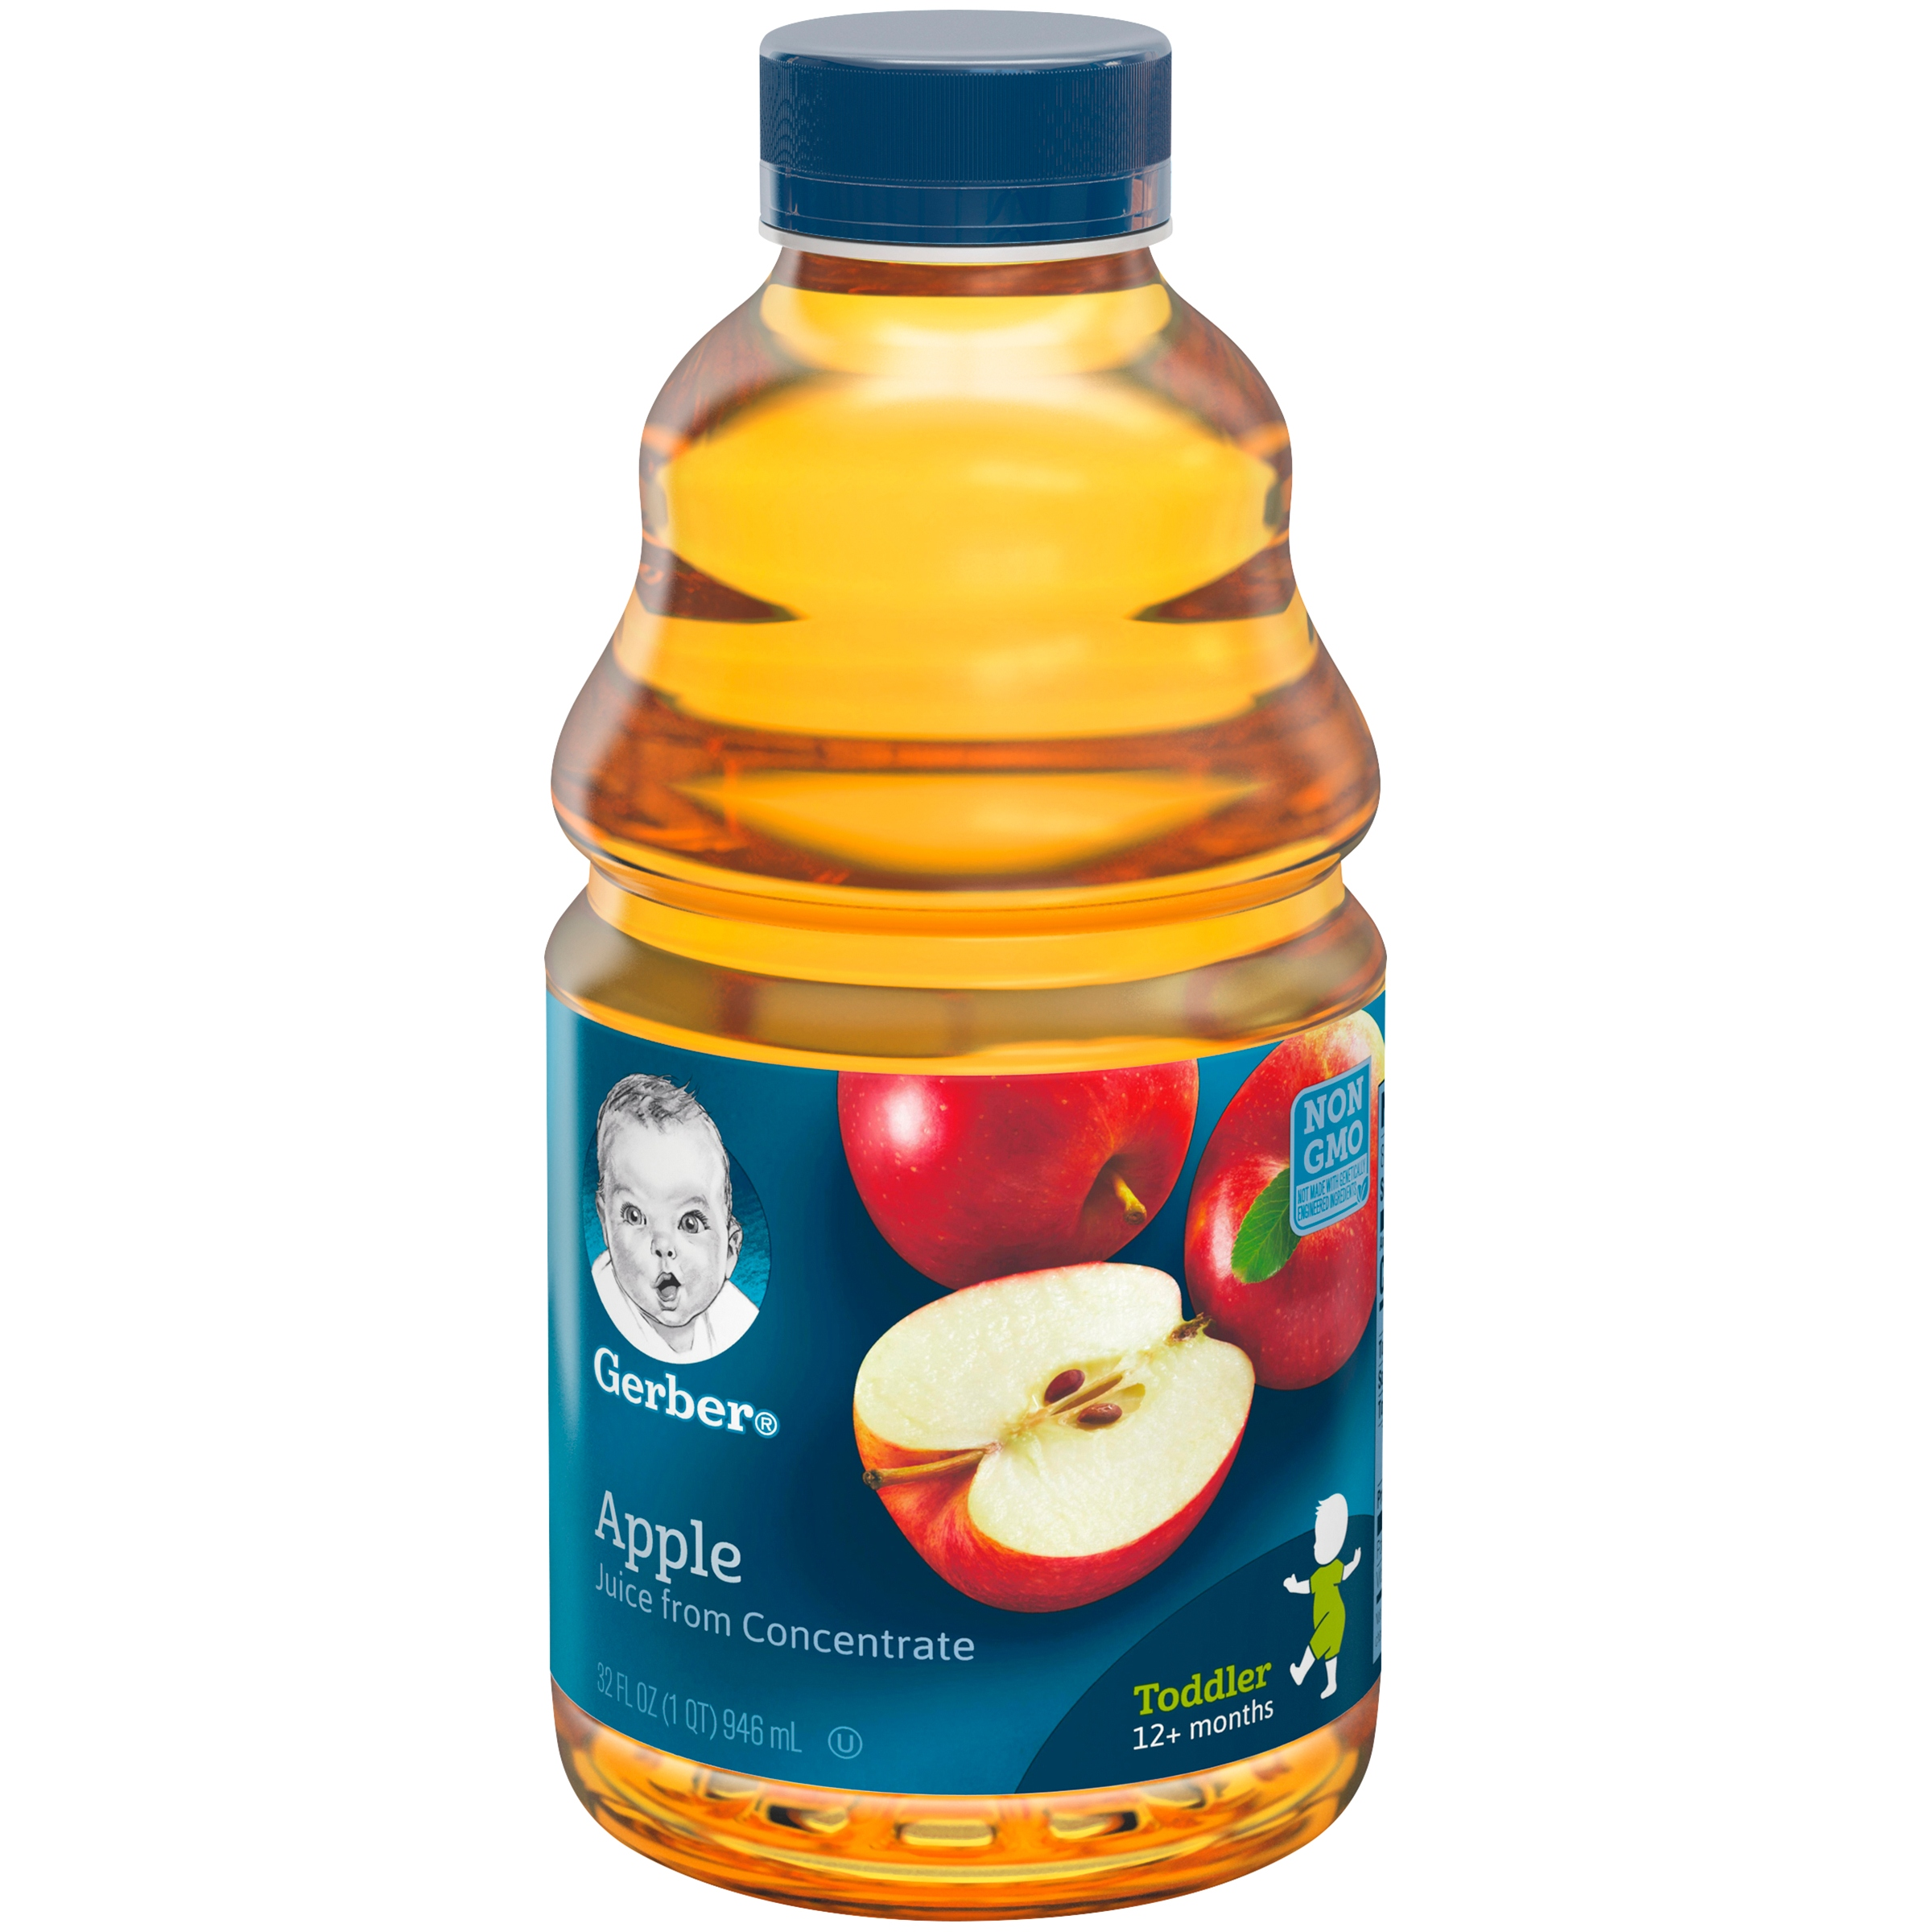 Gerber Apple Juice 32 fl. oz. Bottle